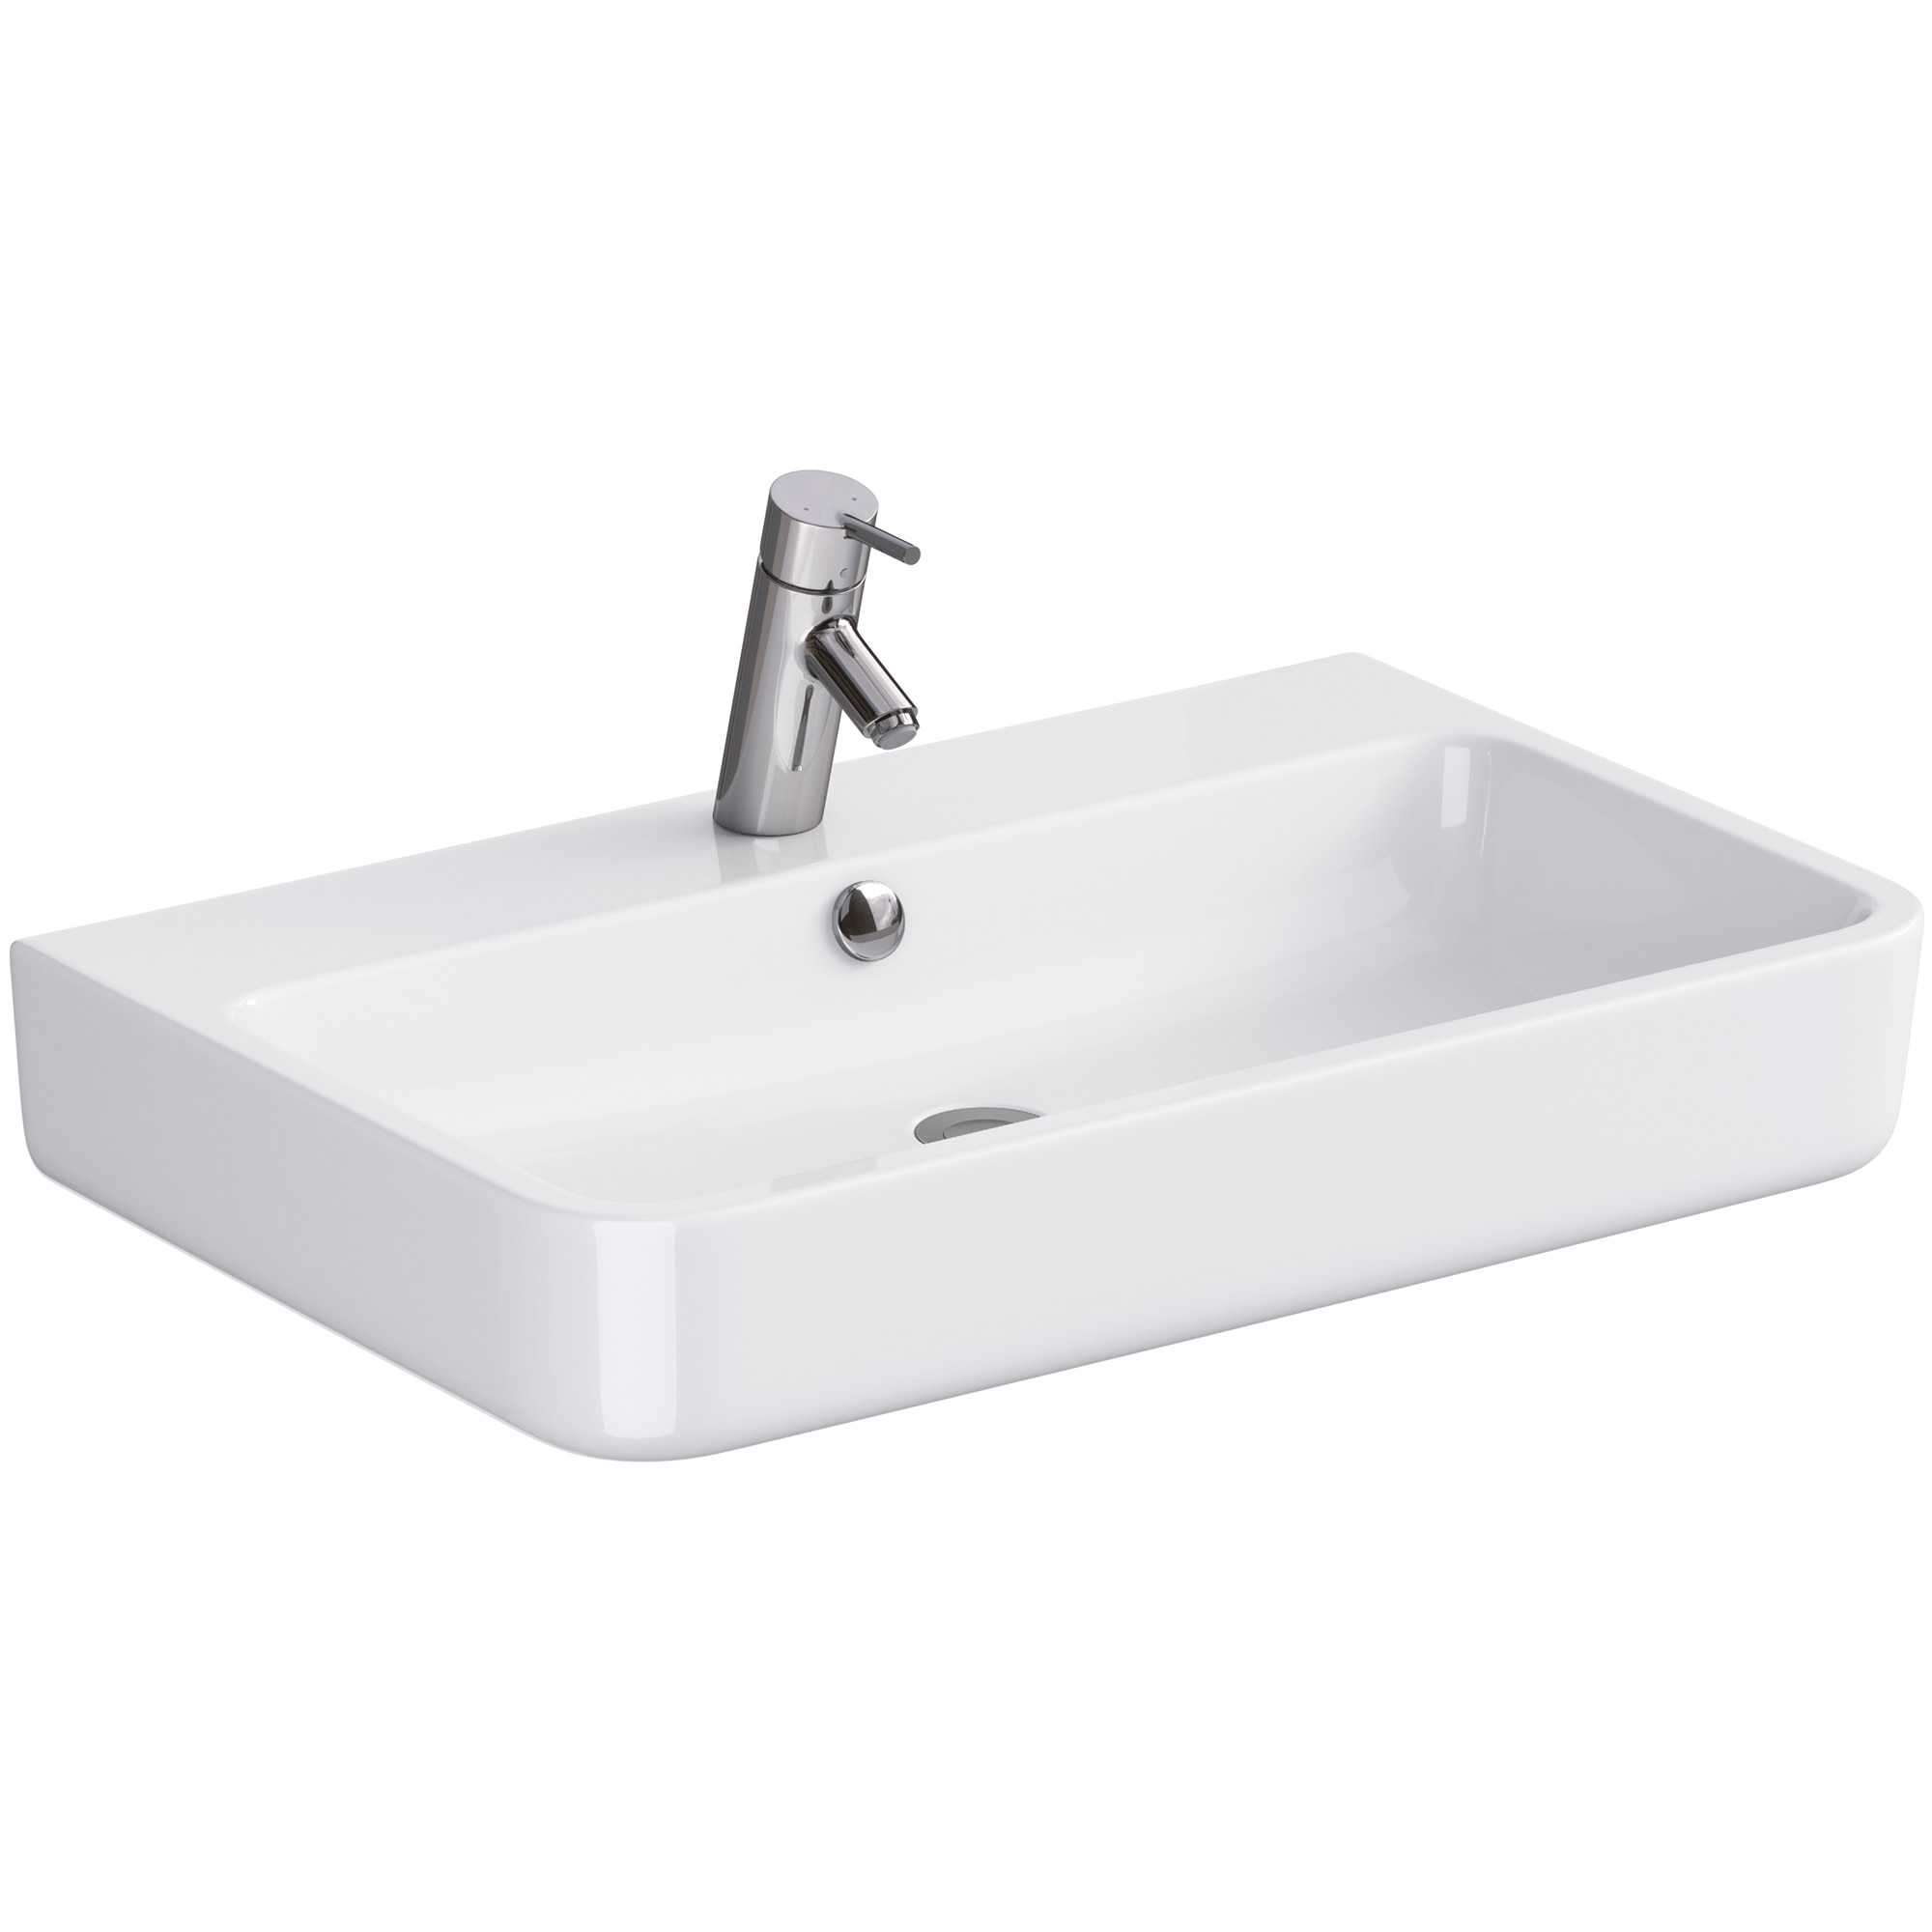 Fotografie Lavoar pentru mobilier simetric Cersanit Urban Harmony OK580-002-BOX, 70x45.5 cm